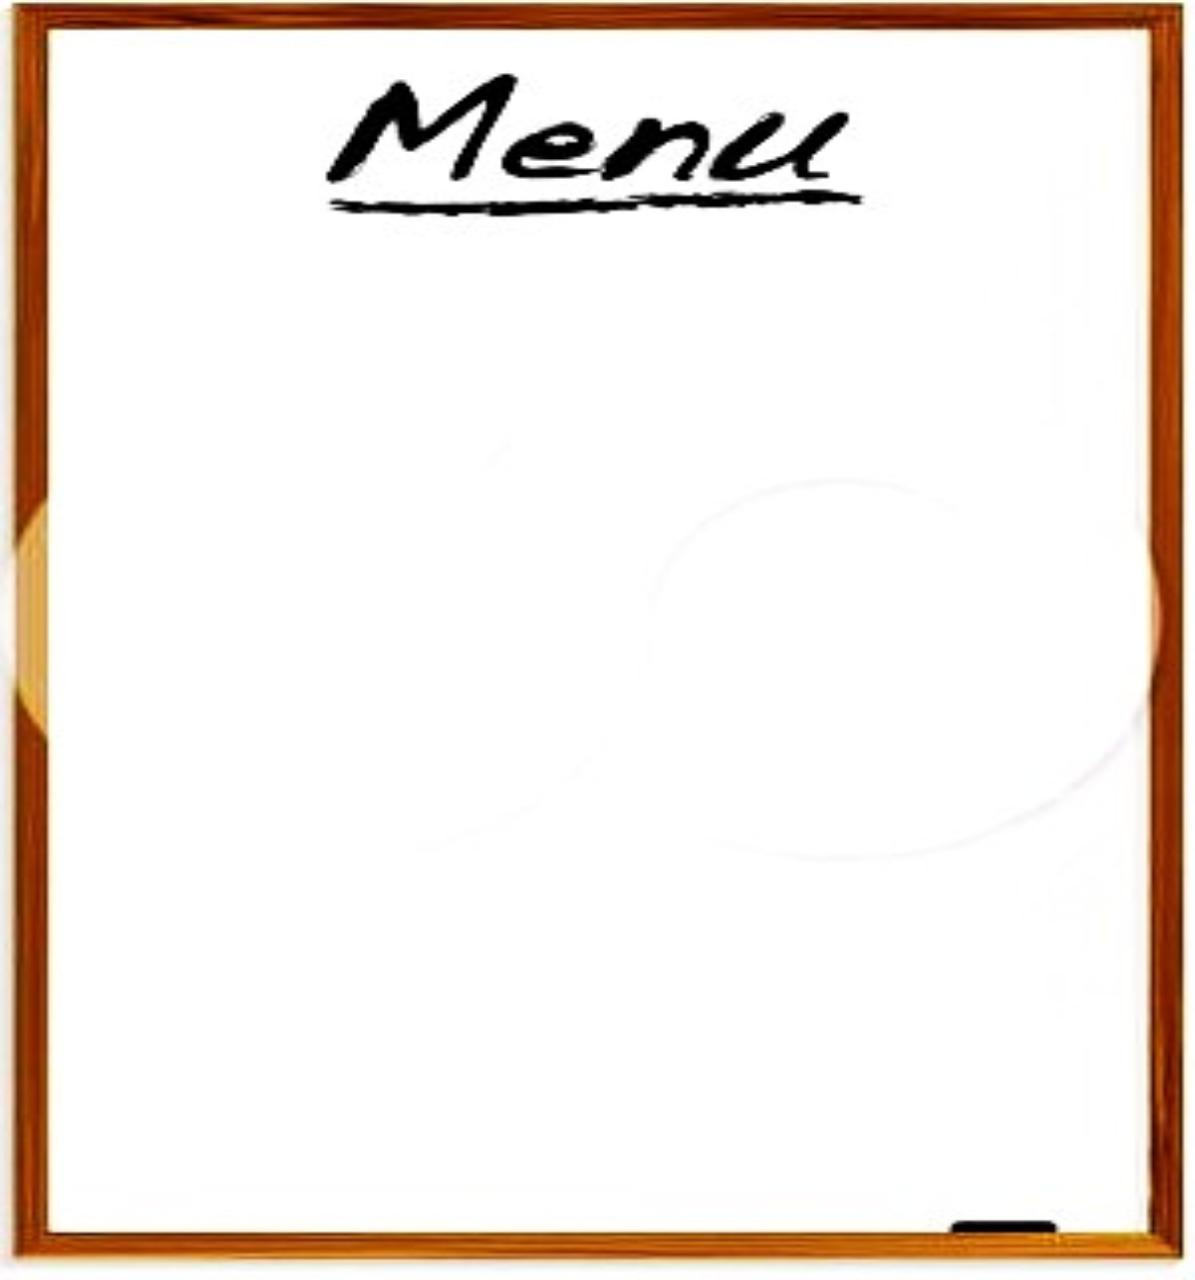 Free Menu Clip Art, Download Free Clip Art, Free Clip Art on.